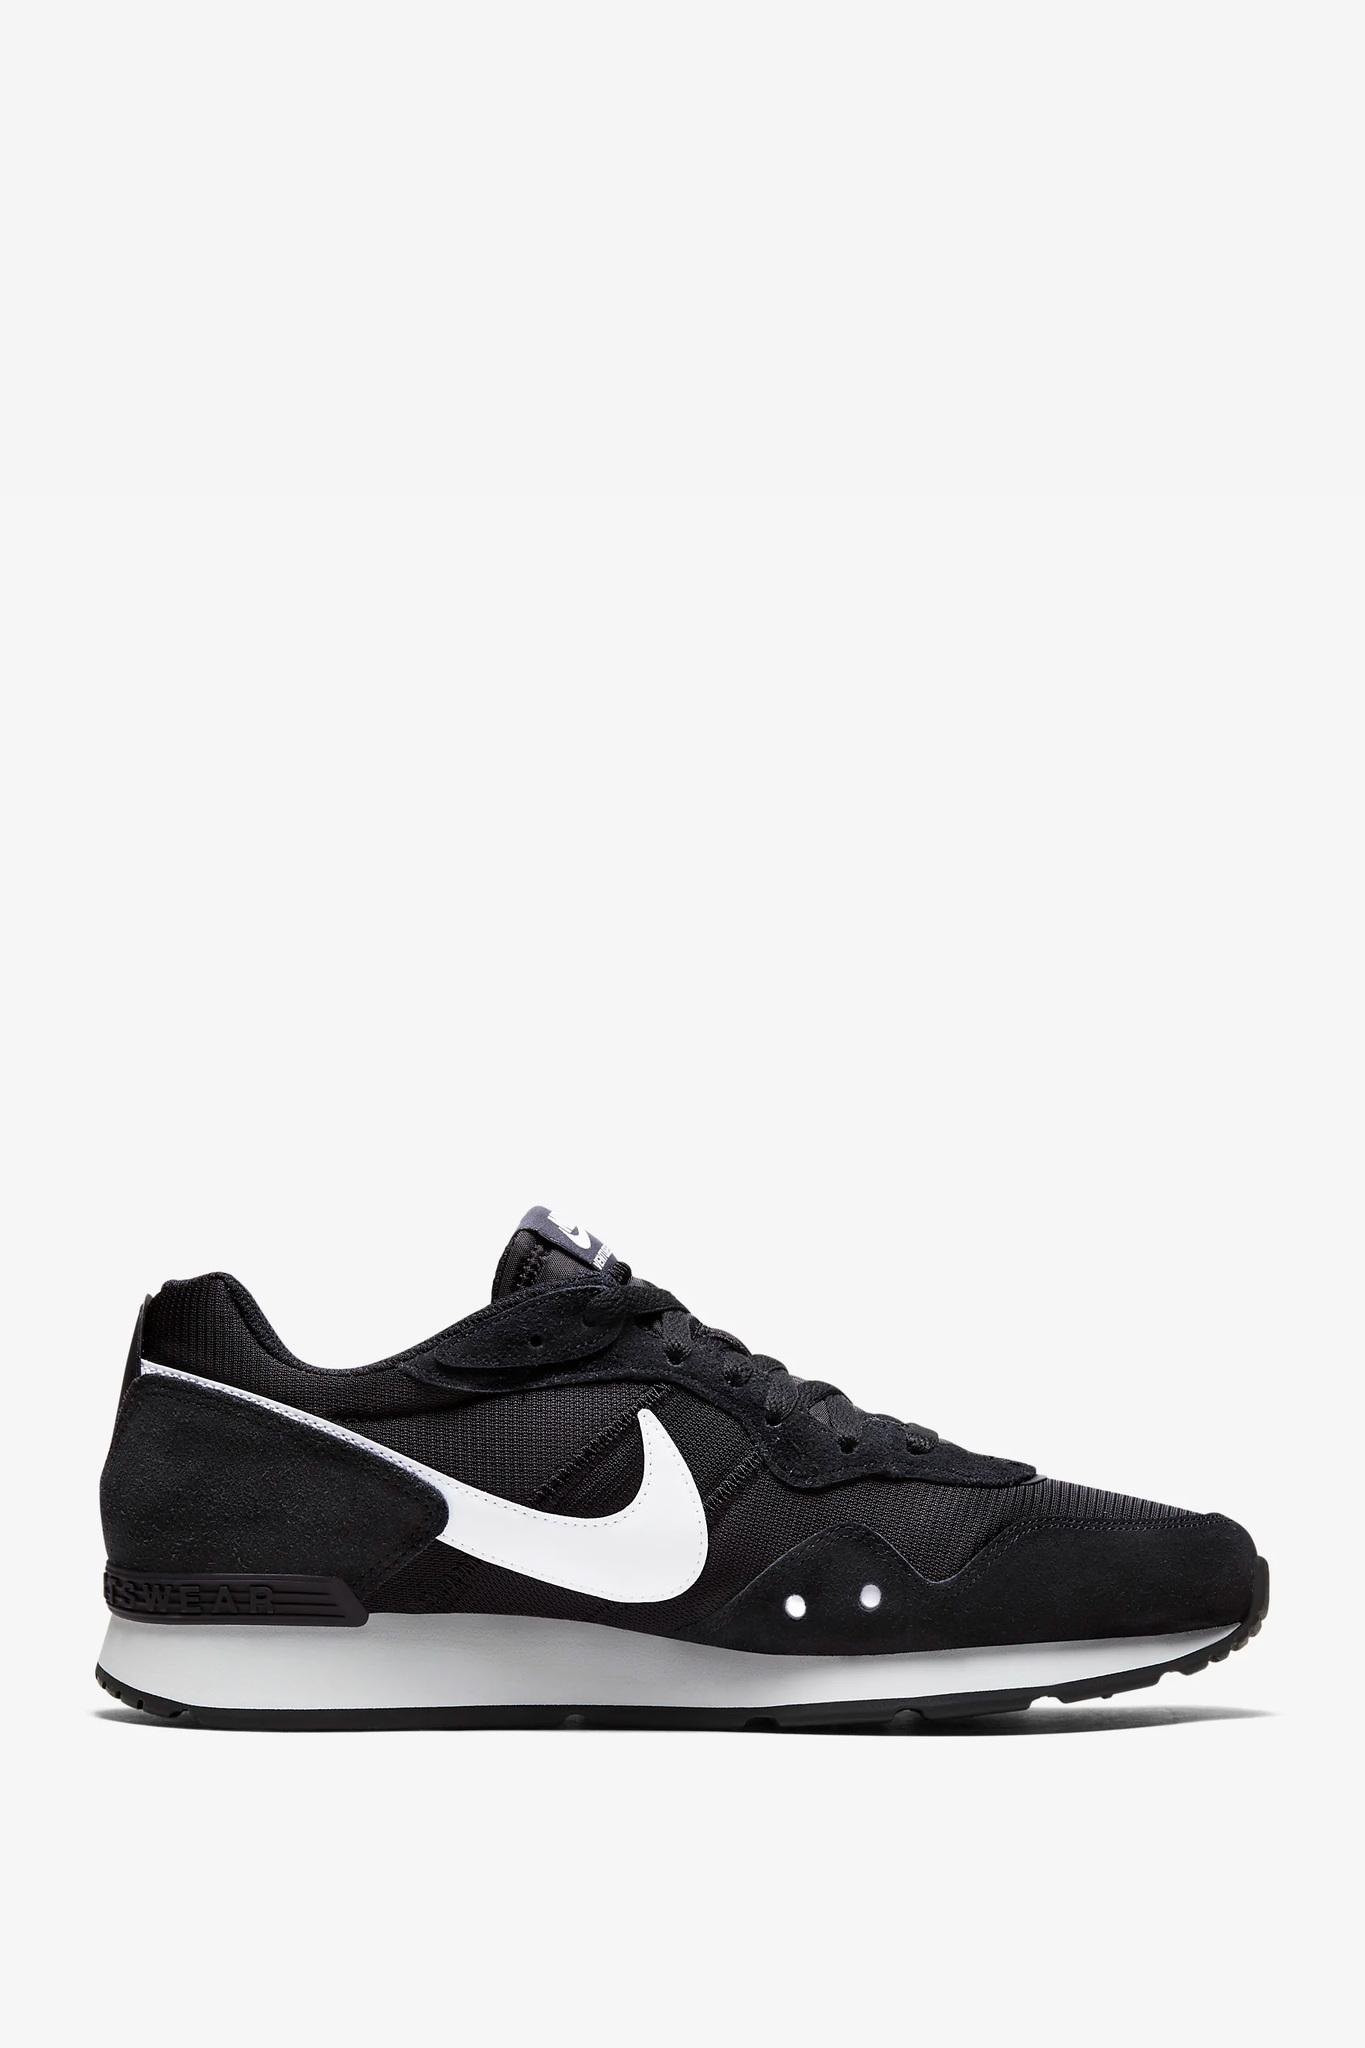 Купить Nike Venture Runner CK2944-002 219361700-1234